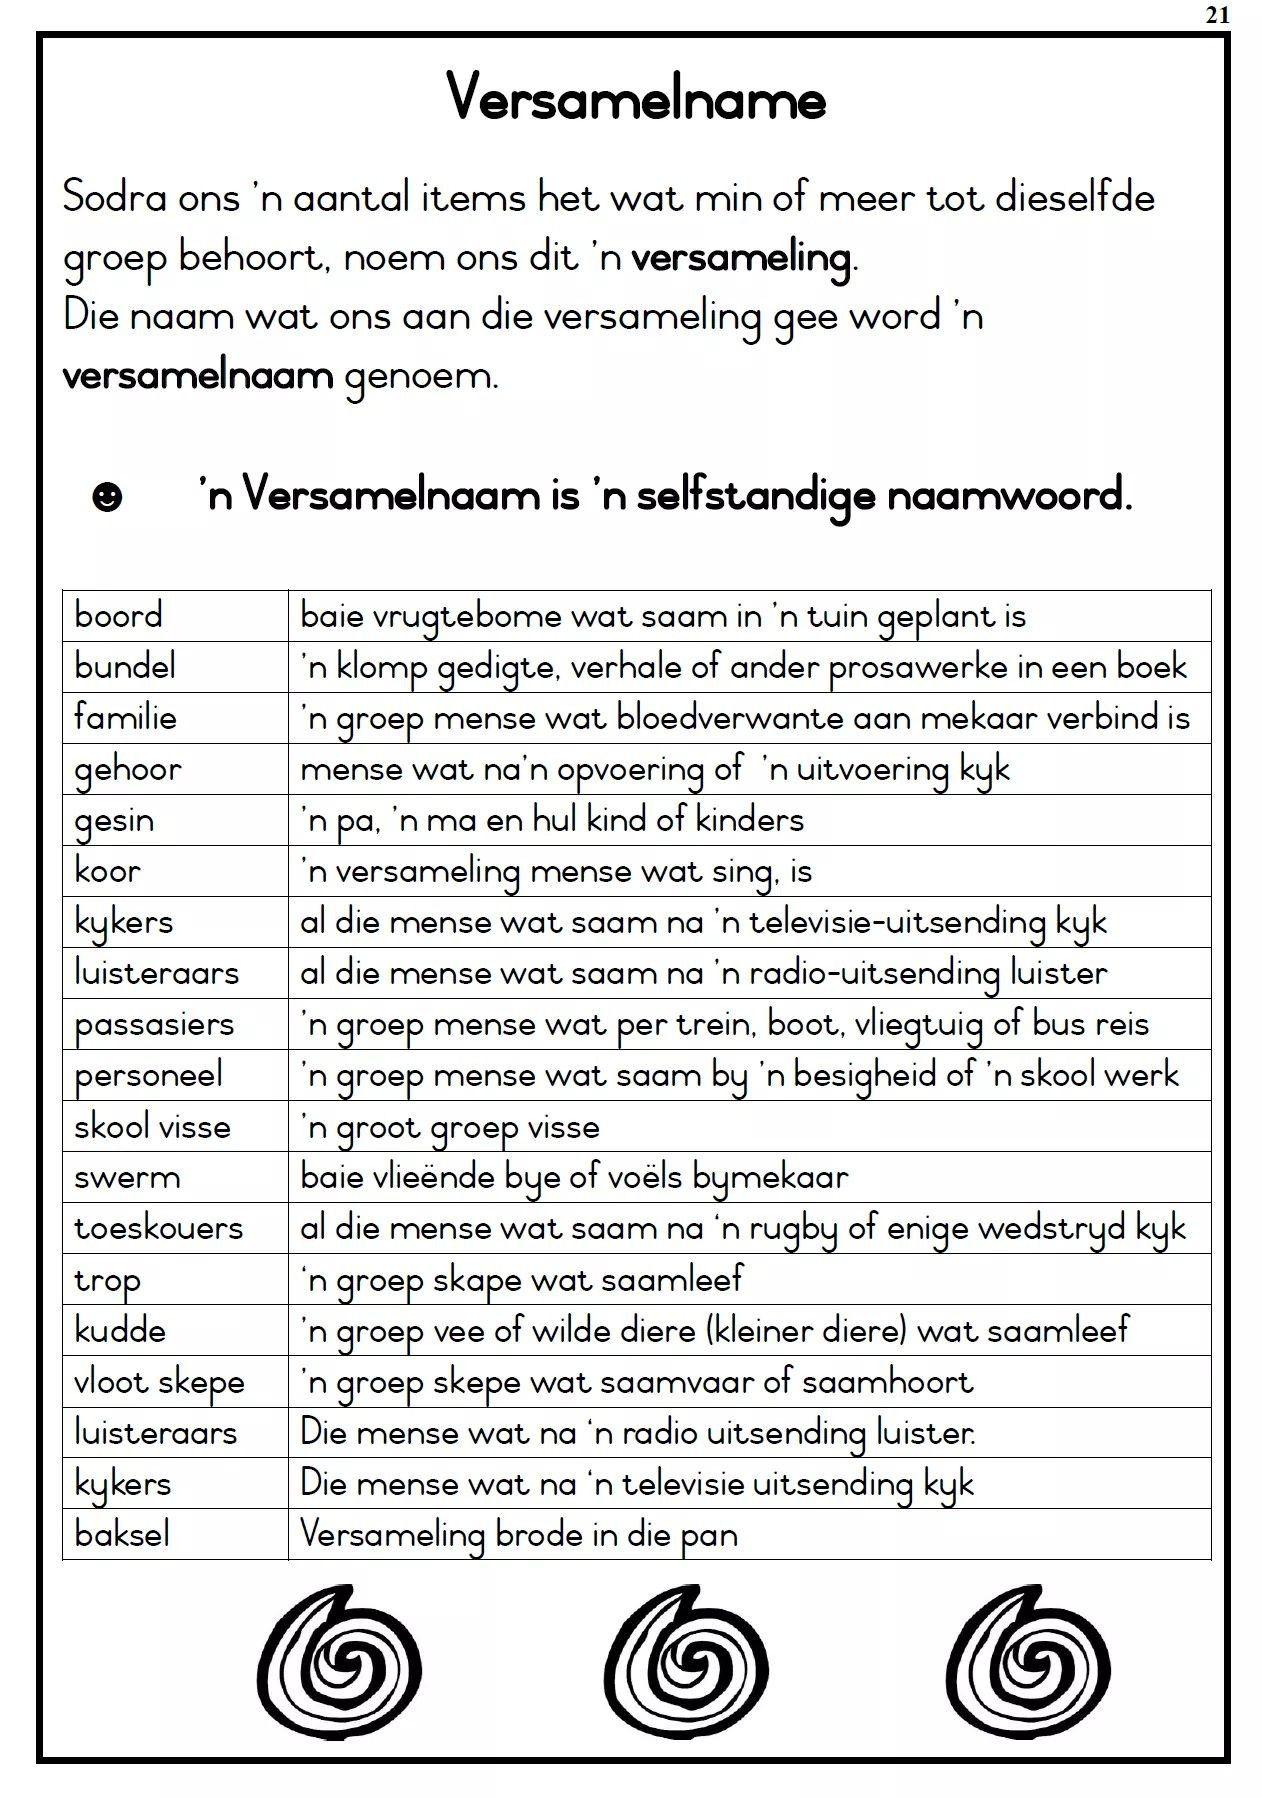 Afrikaans Worksheets Grade 7 Caps Printable Worksheets And Activities For Teachers Parents Tutors And Homeschool Families